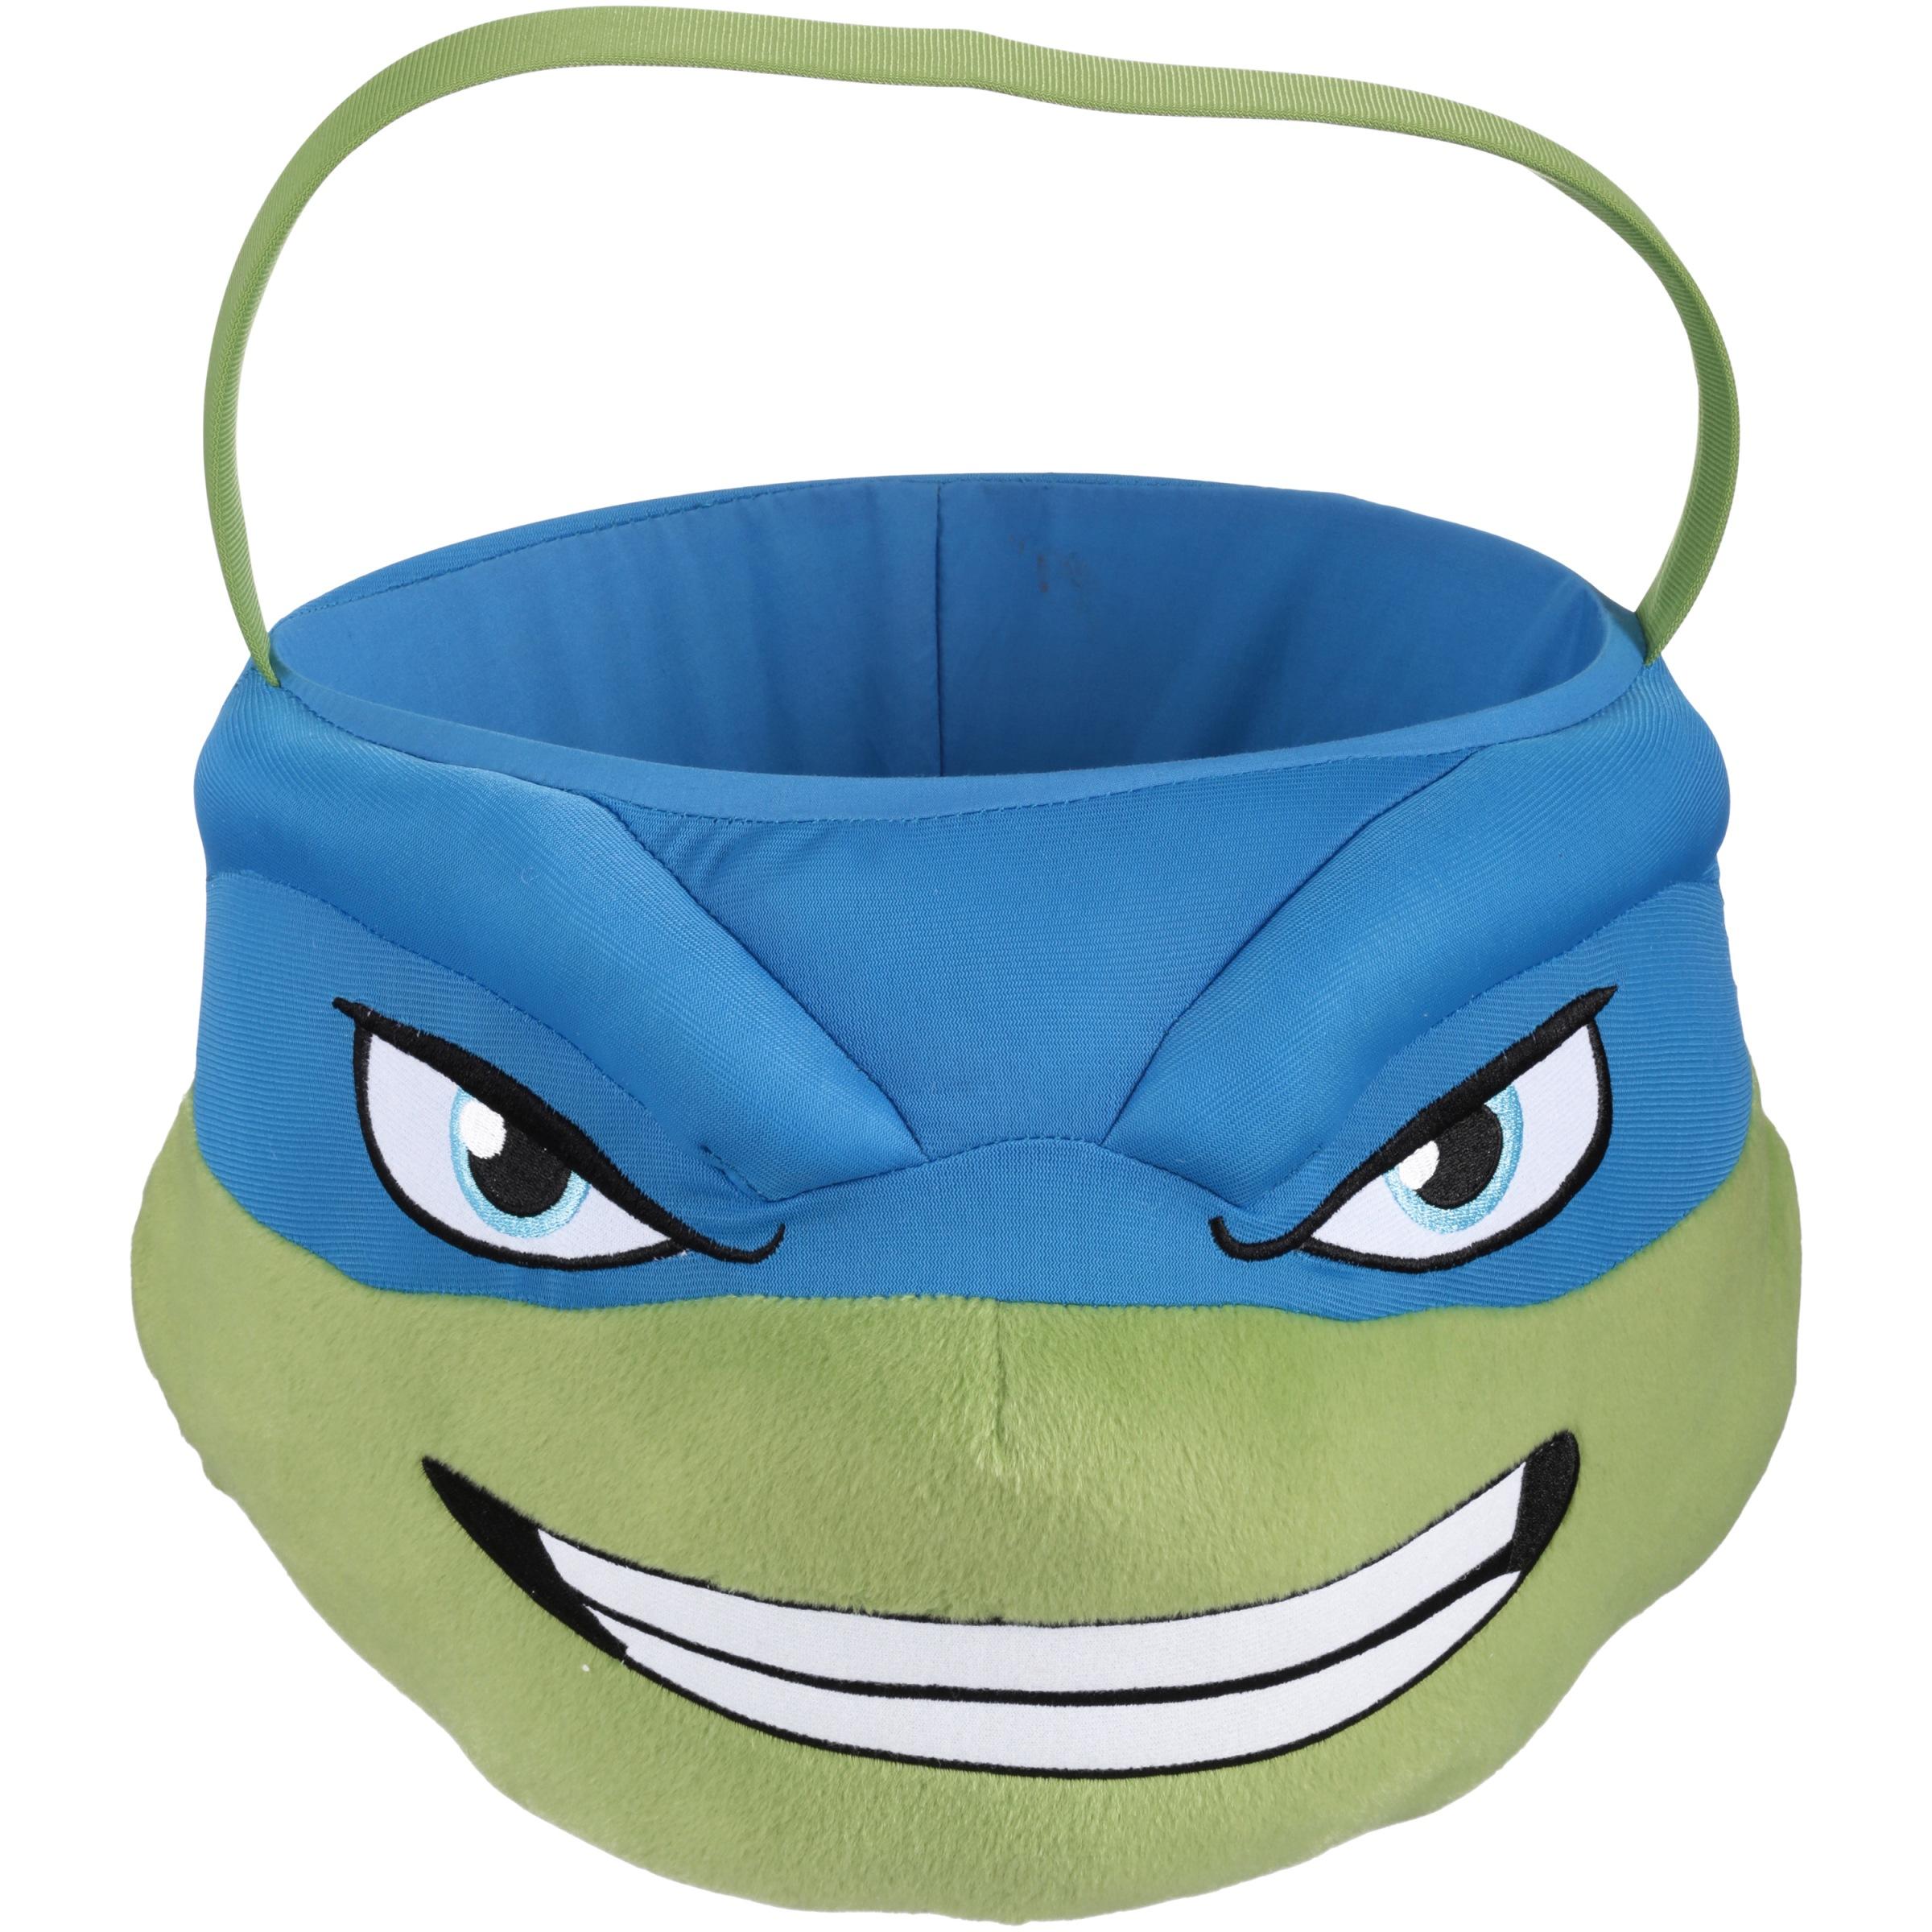 Nickelodeon™ Teenage Mutant Ninja Turtlez Jumbo Plush Basket